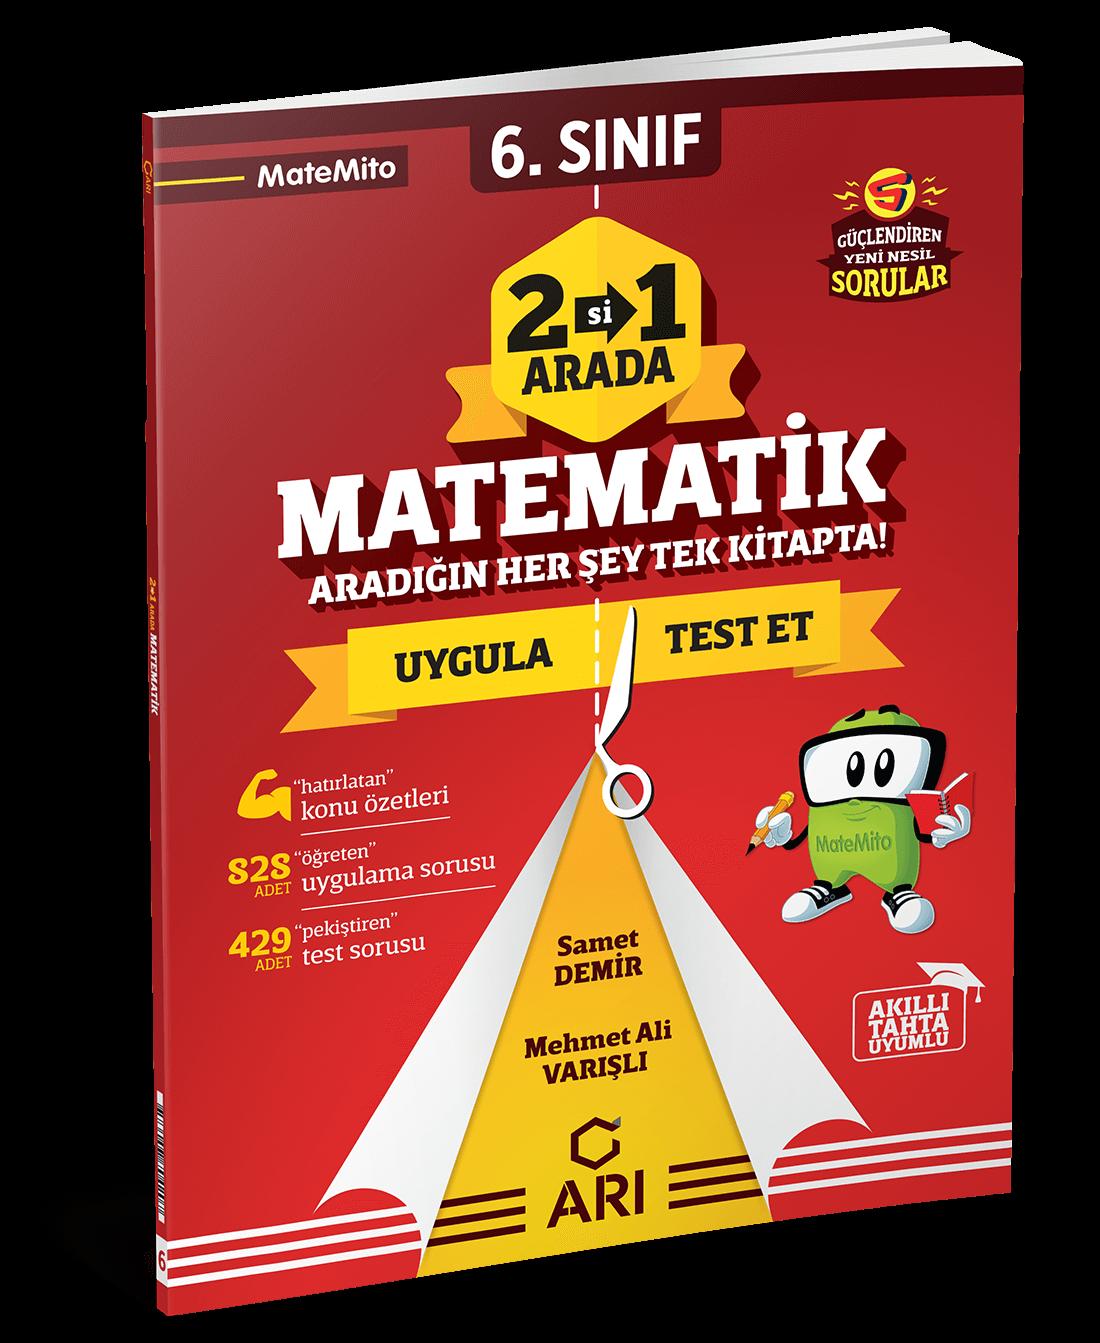 6.Sınıf Matemito 2'si 1 Arada Matematik